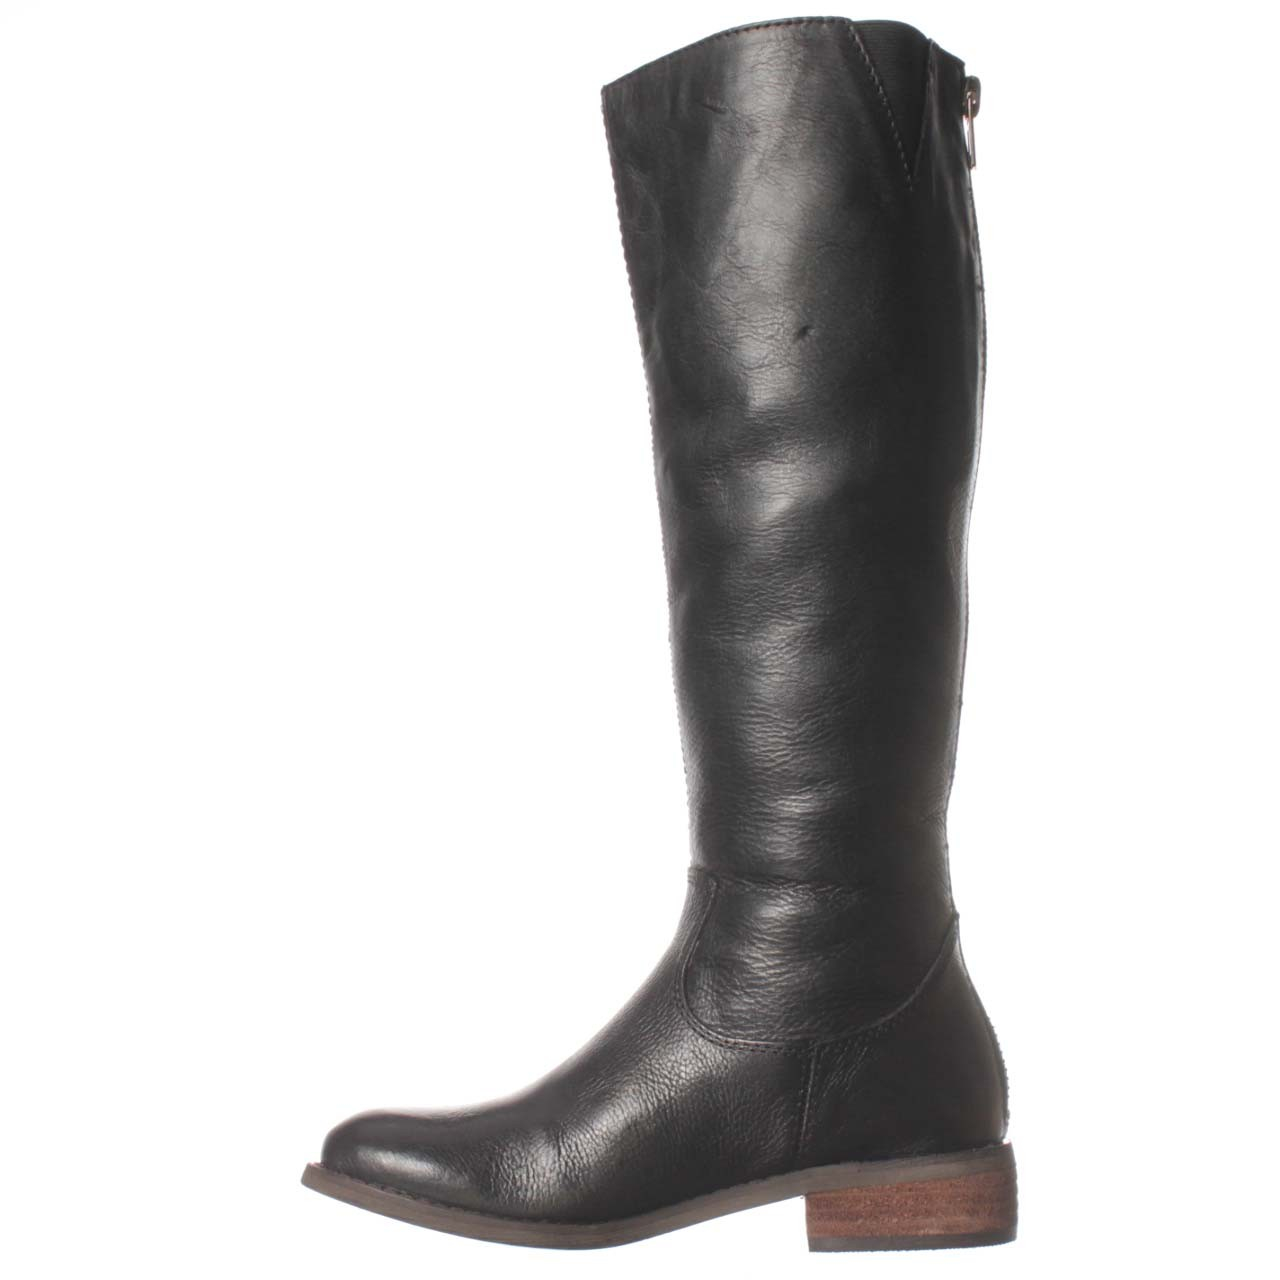 dolce vita dv by lilli knee high boot in black lyst